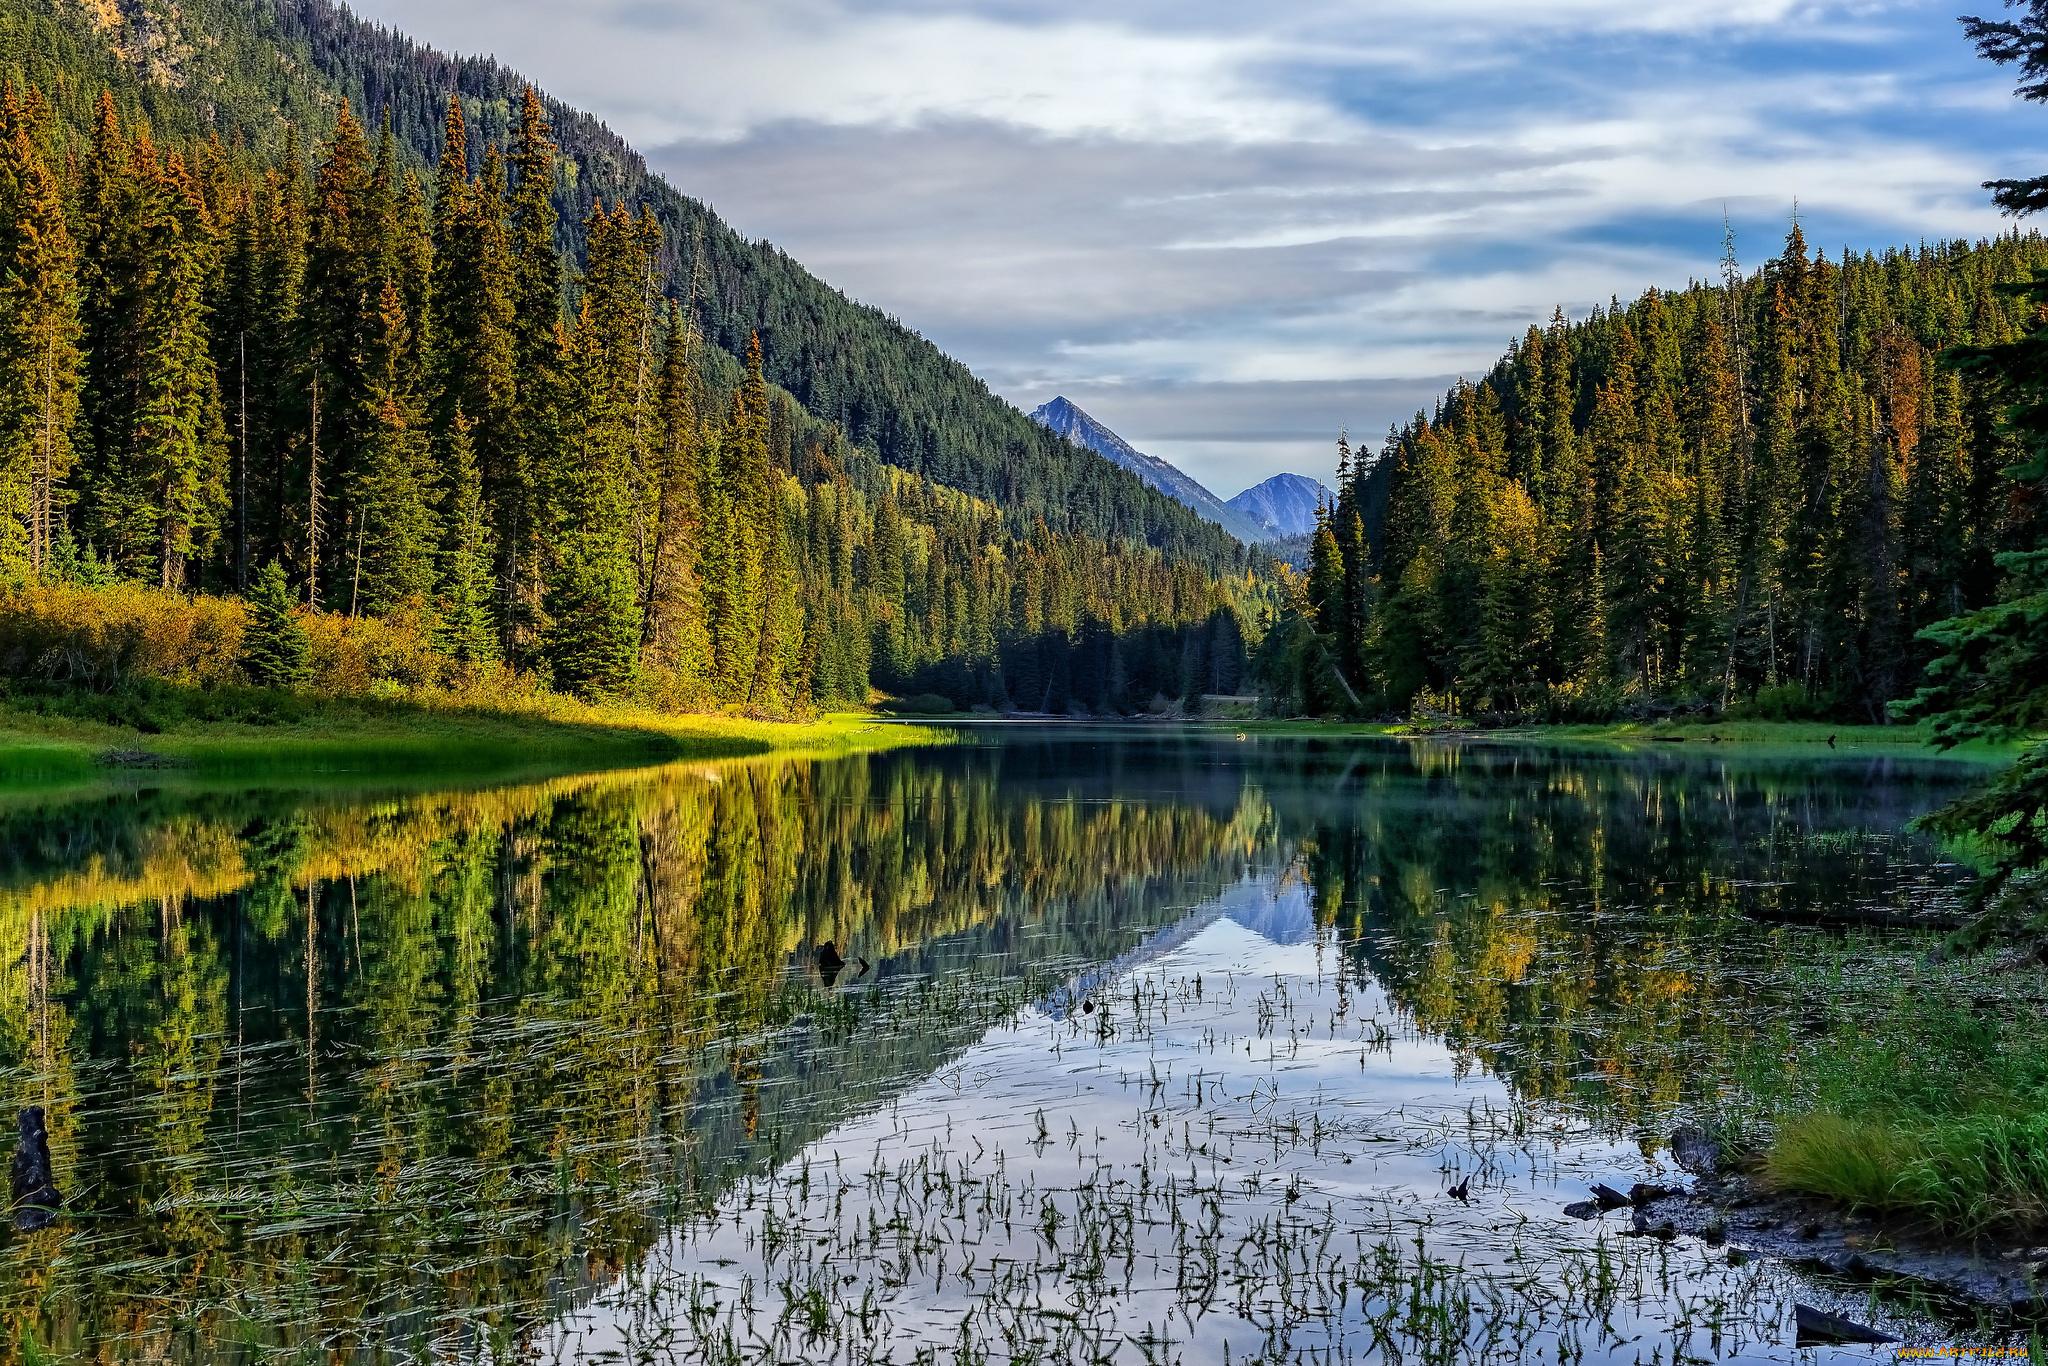 Озеро, гора, зеленый лес  № 621656 без смс